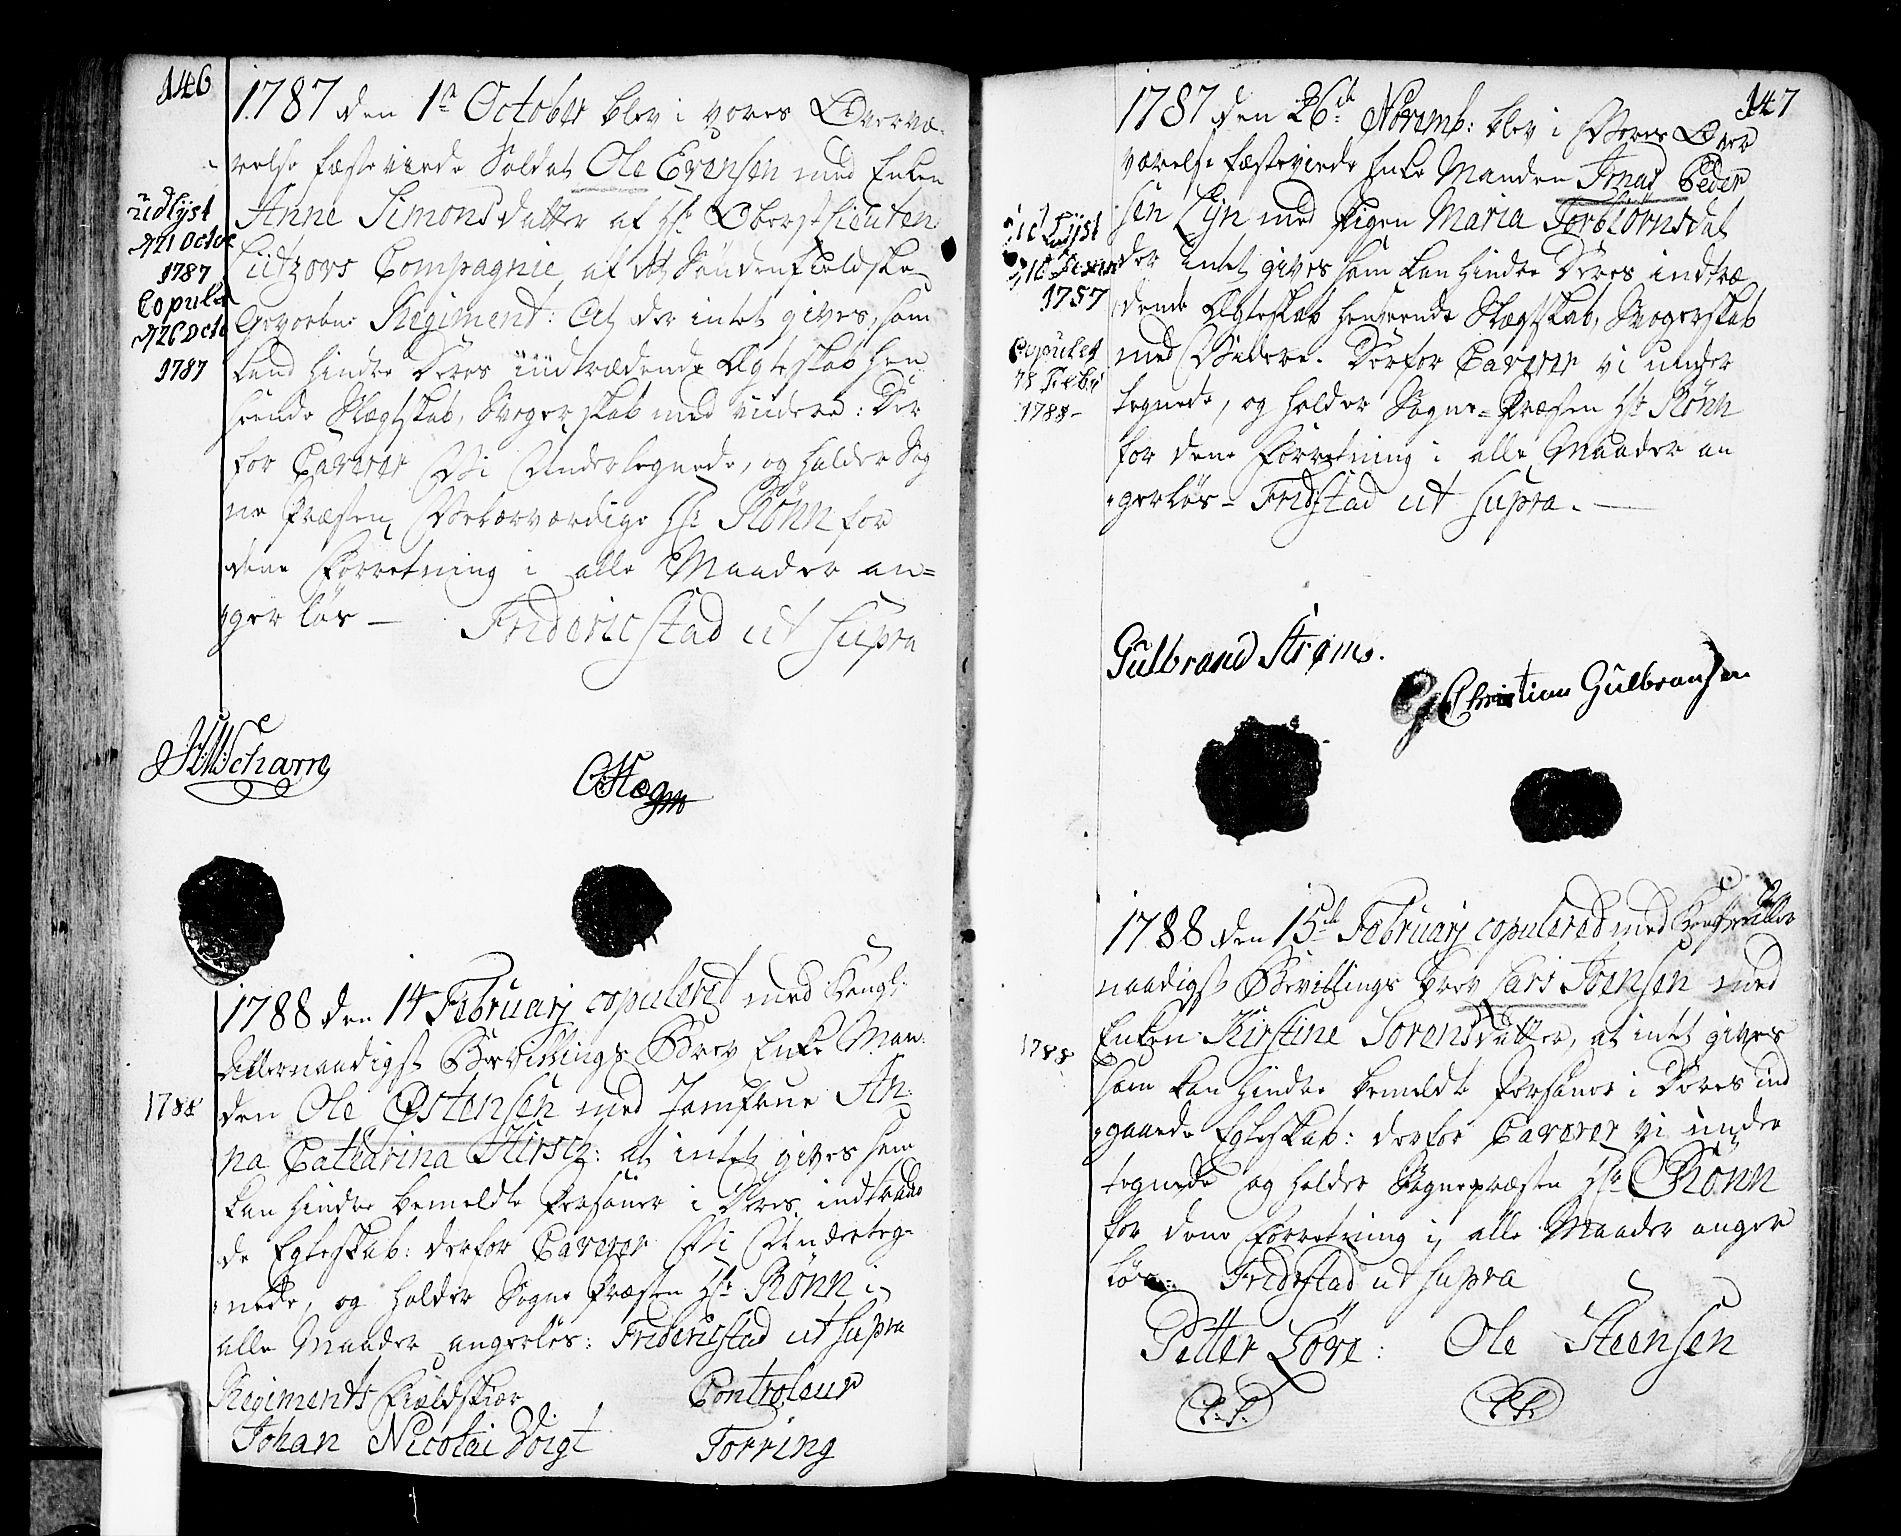 SAO, Fredrikstad prestekontor Kirkebøker, F/Fa/L0002: Ministerialbok nr. 2, 1750-1804, s. 146-147